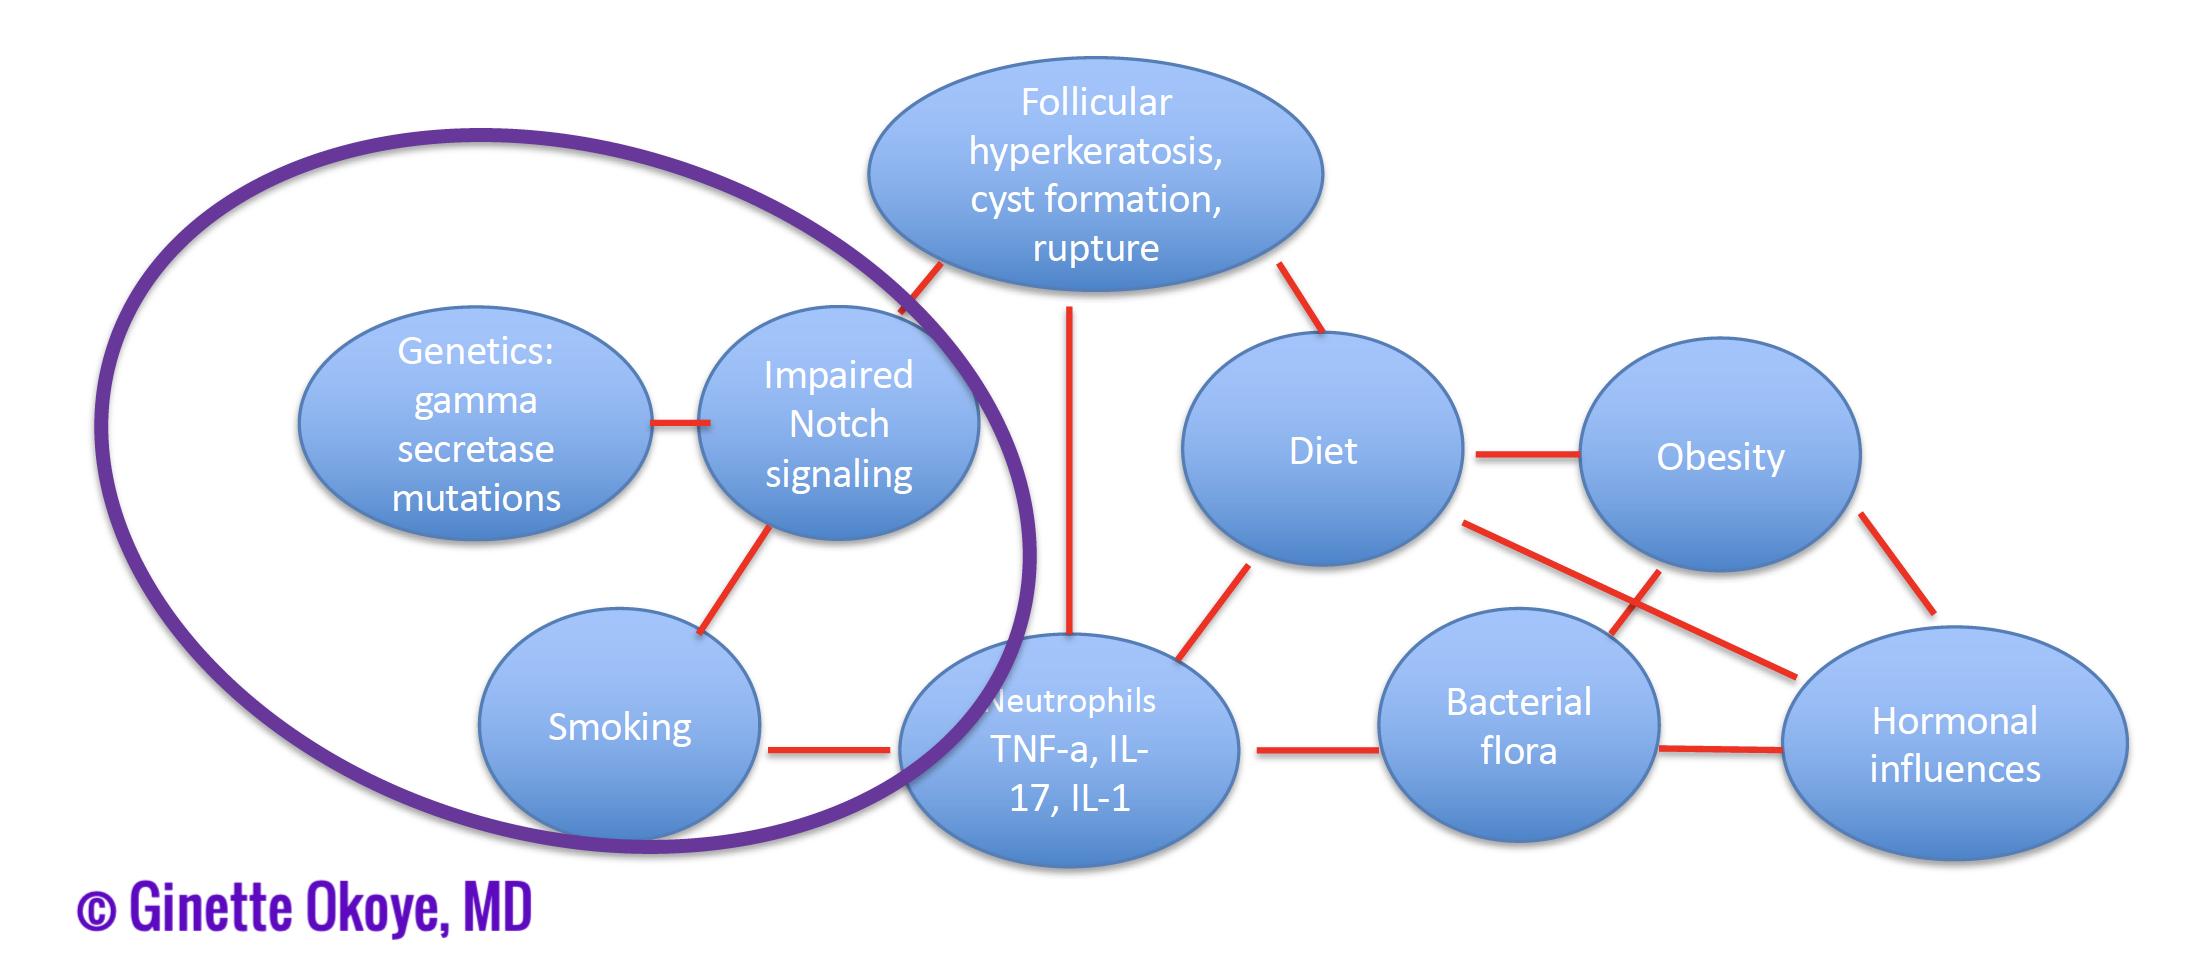 Pathogenesis of follicular subtype of HS